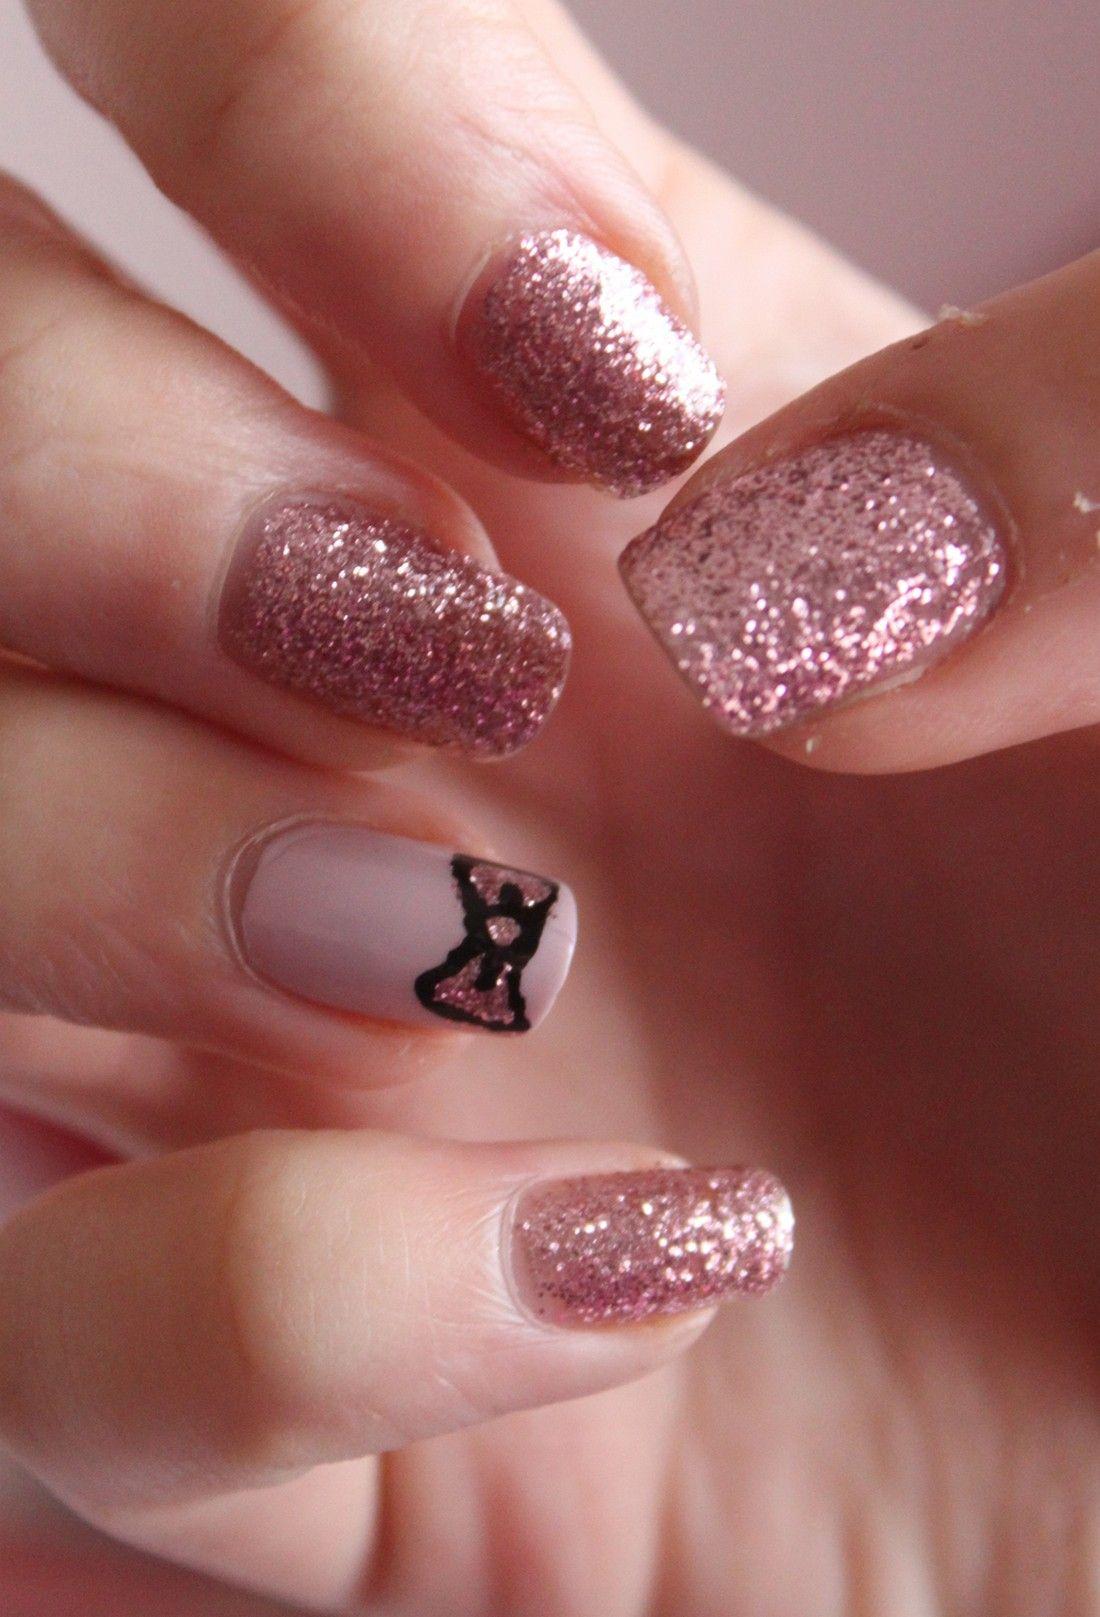 Pin by Eva David on nails | Pinterest | Short acrylics, Acrylic nail ...